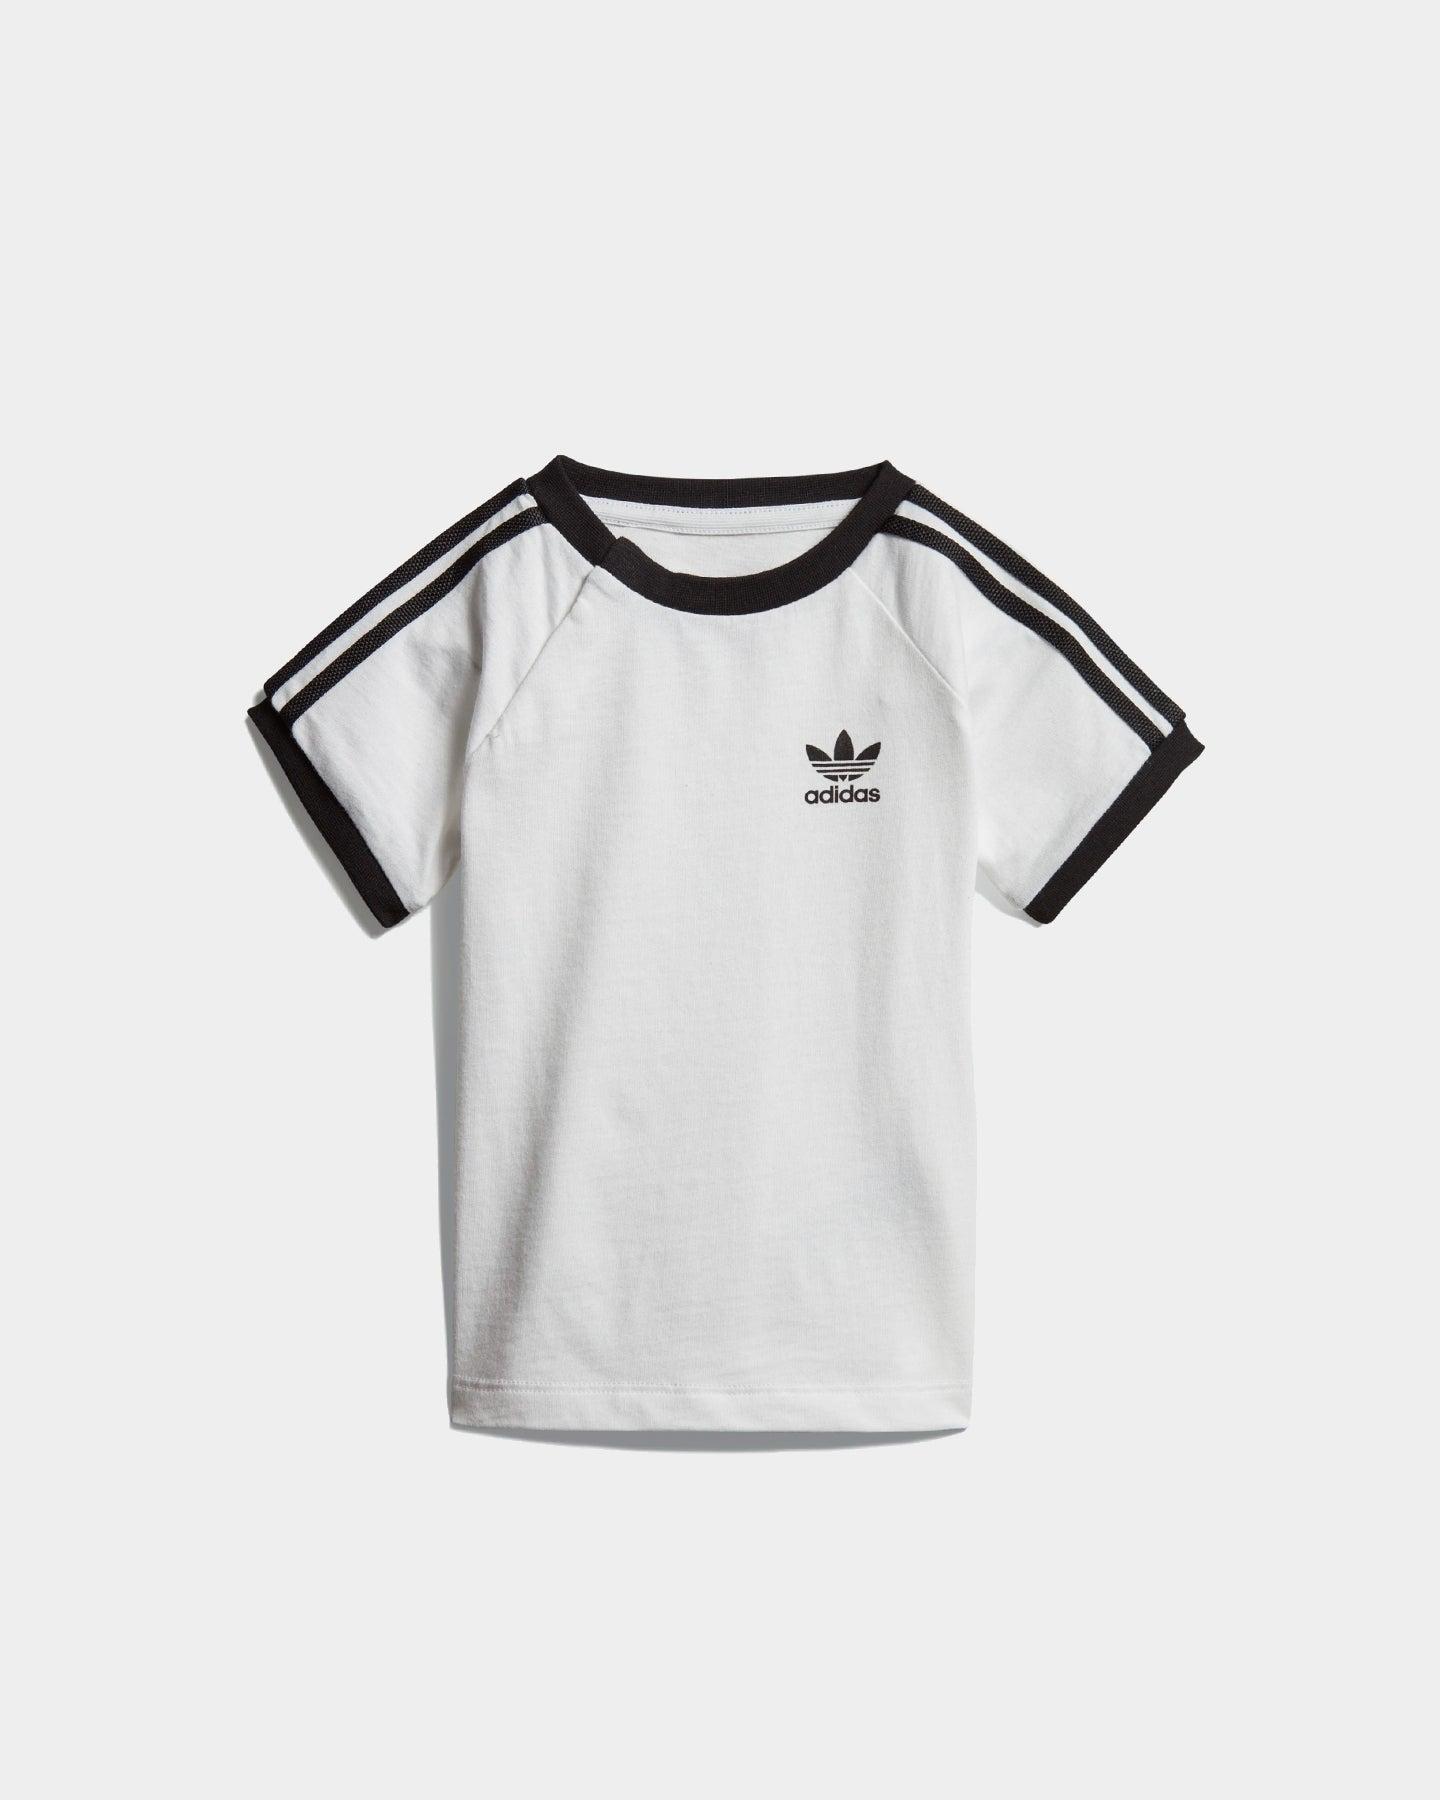 3 Stripes Tee Mens in BlackWhite by Adidas | WSS